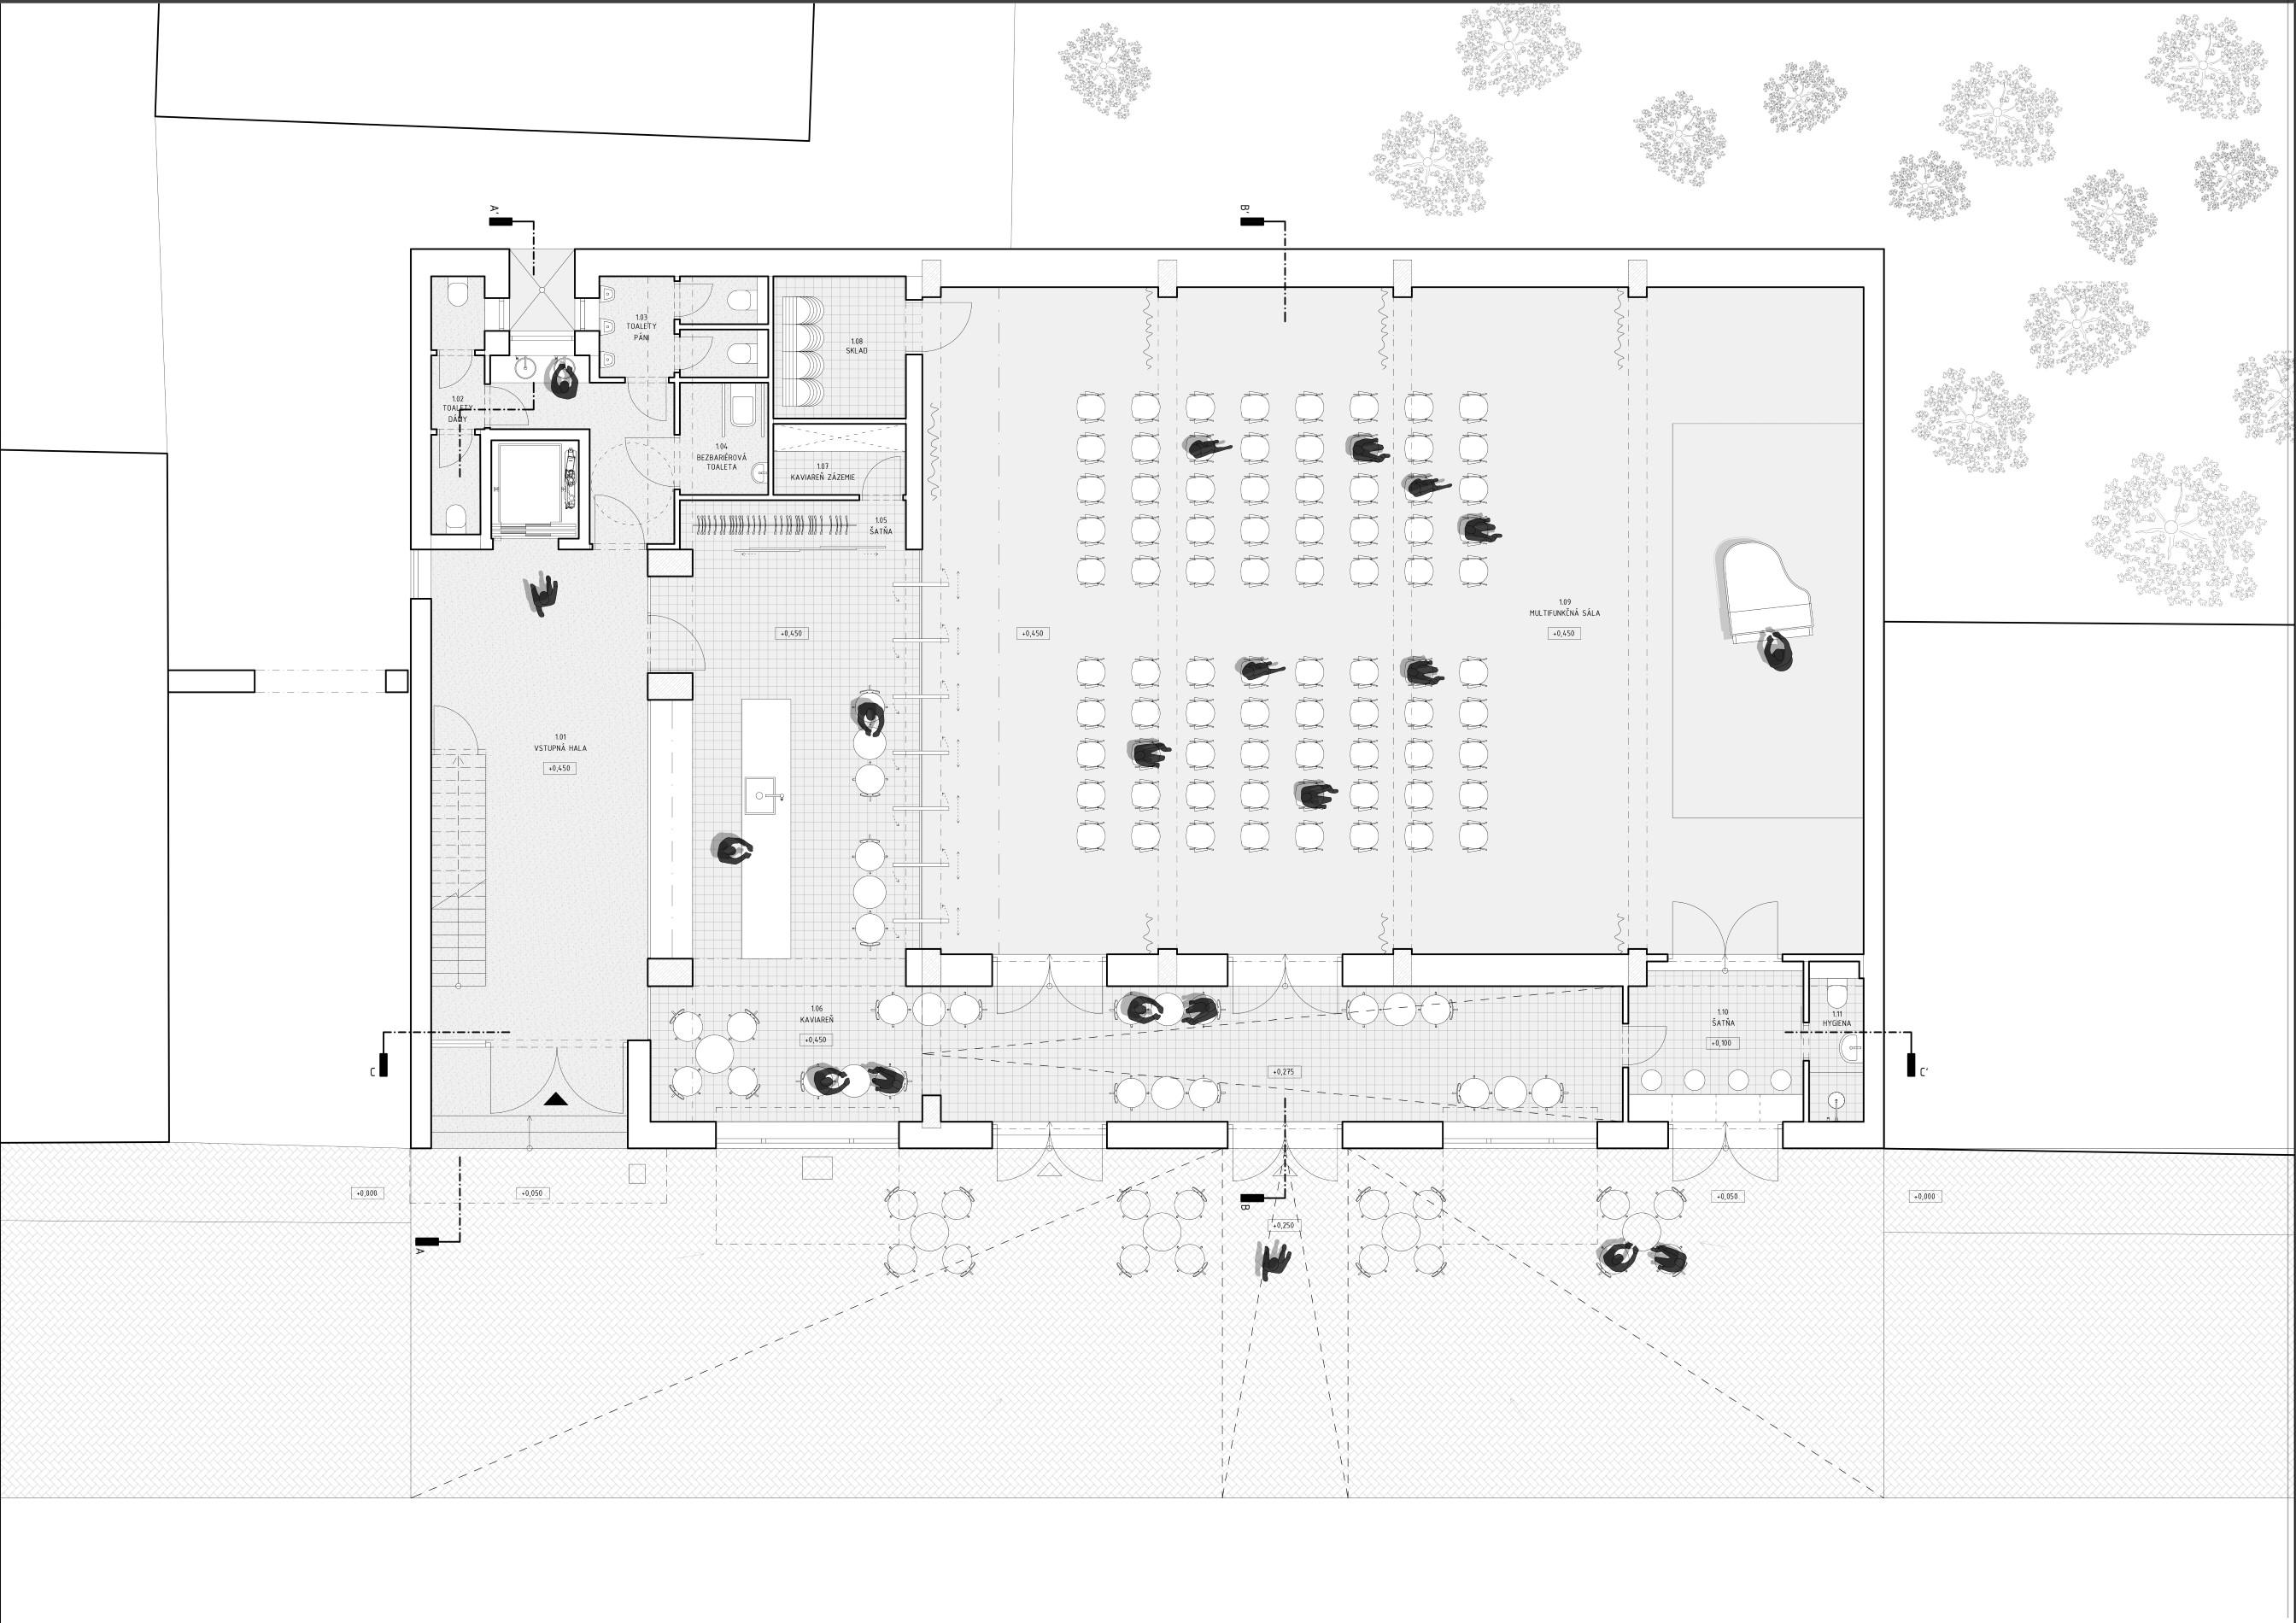 KINO-PALACE-NITRA_JURAJ-HUBINSKY_01-NP.jpg